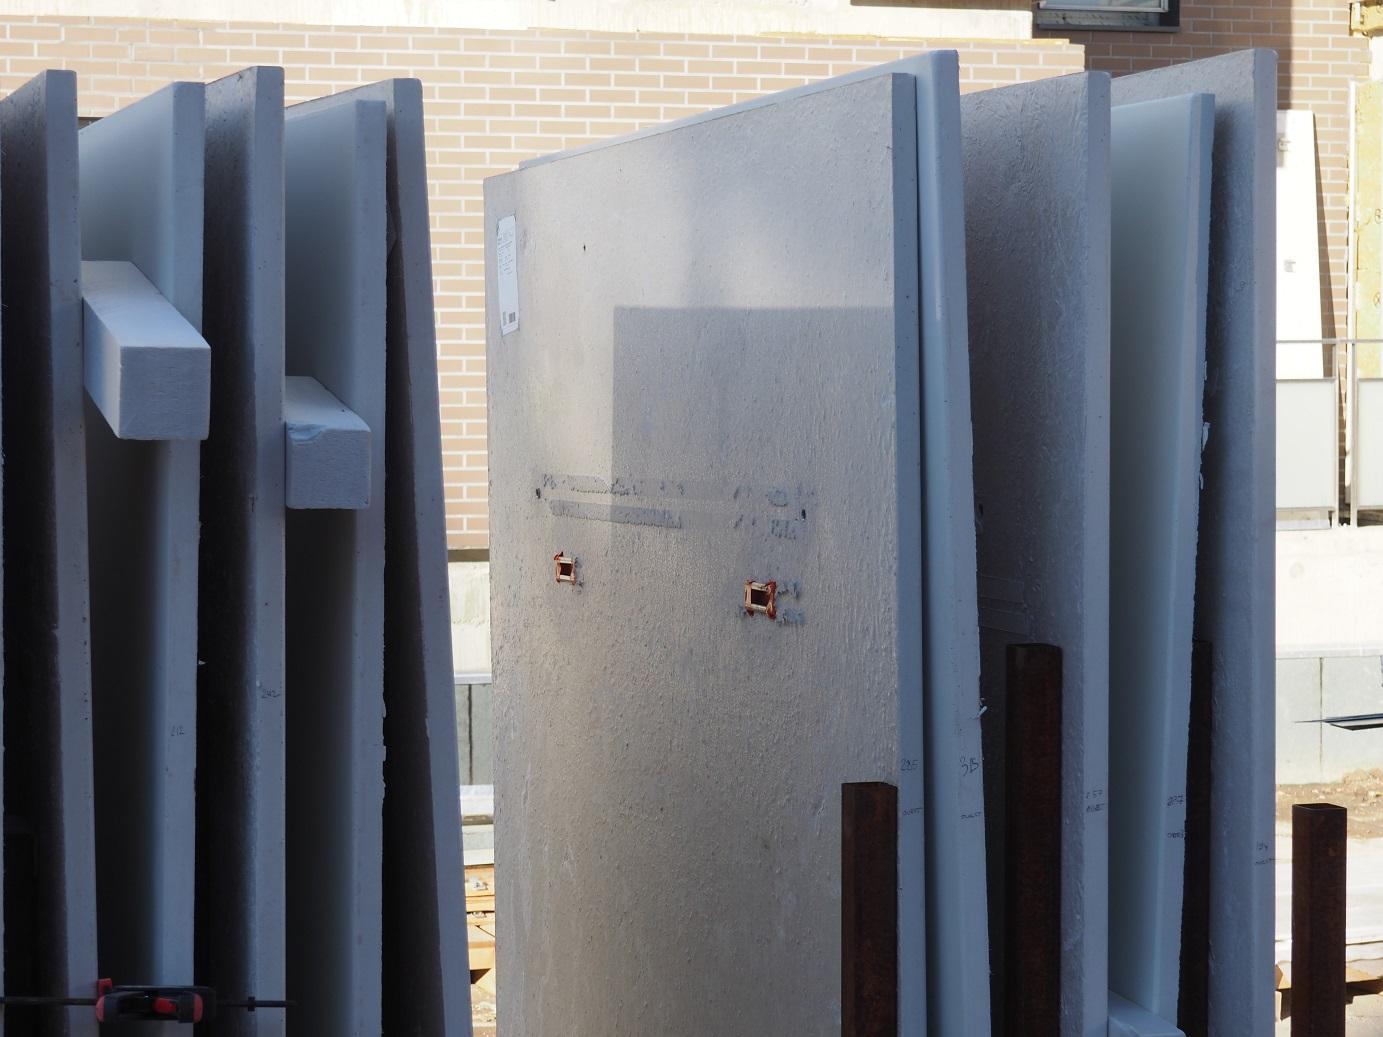 Big panels in UHPC